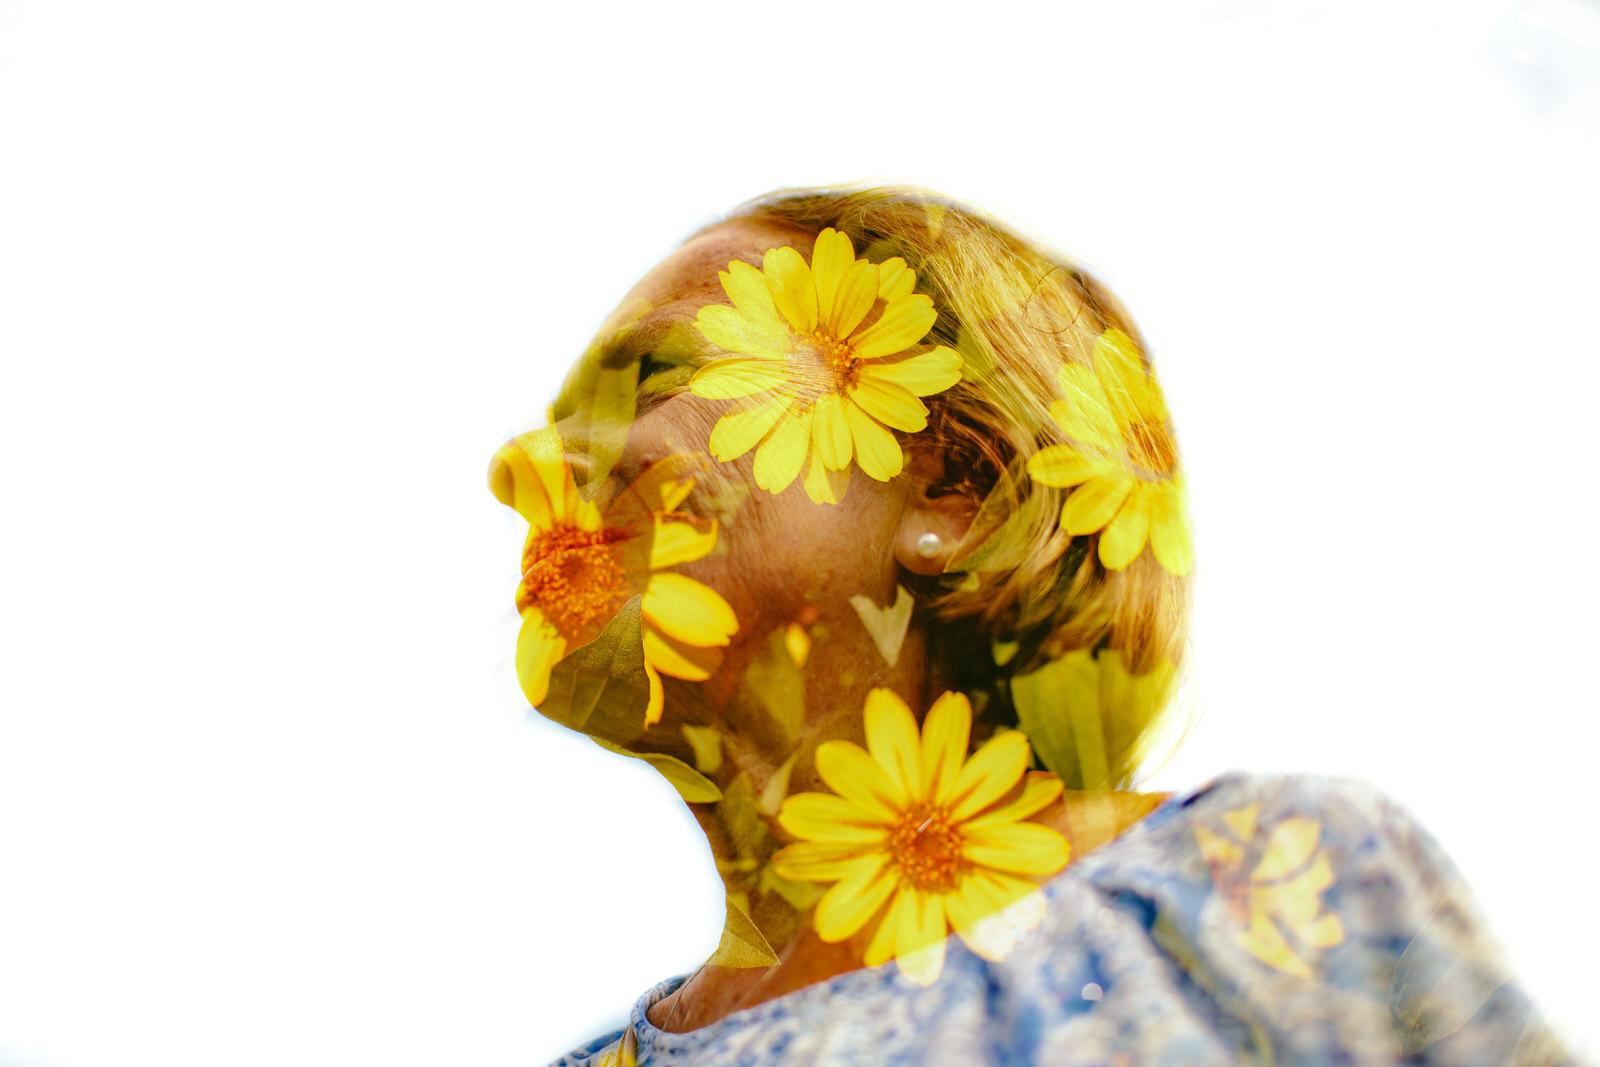 double-exposure-flowers-tiny-house-photo-portrait-mom.jpg